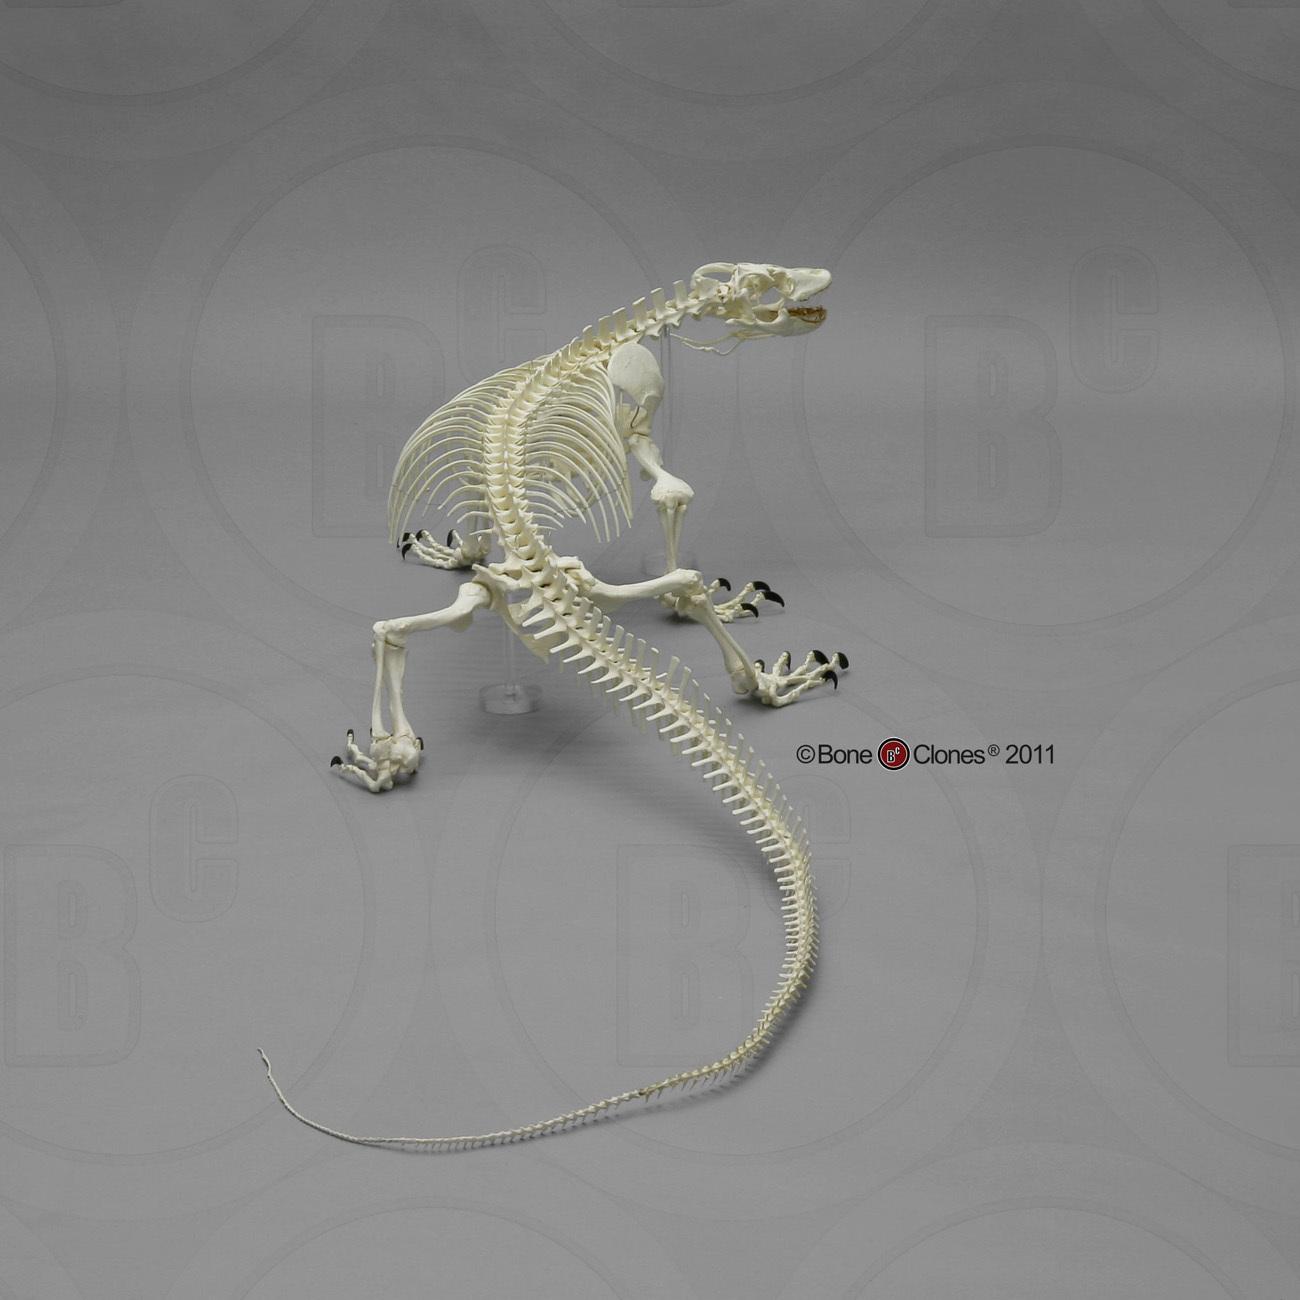 Monitor lizard anatomy